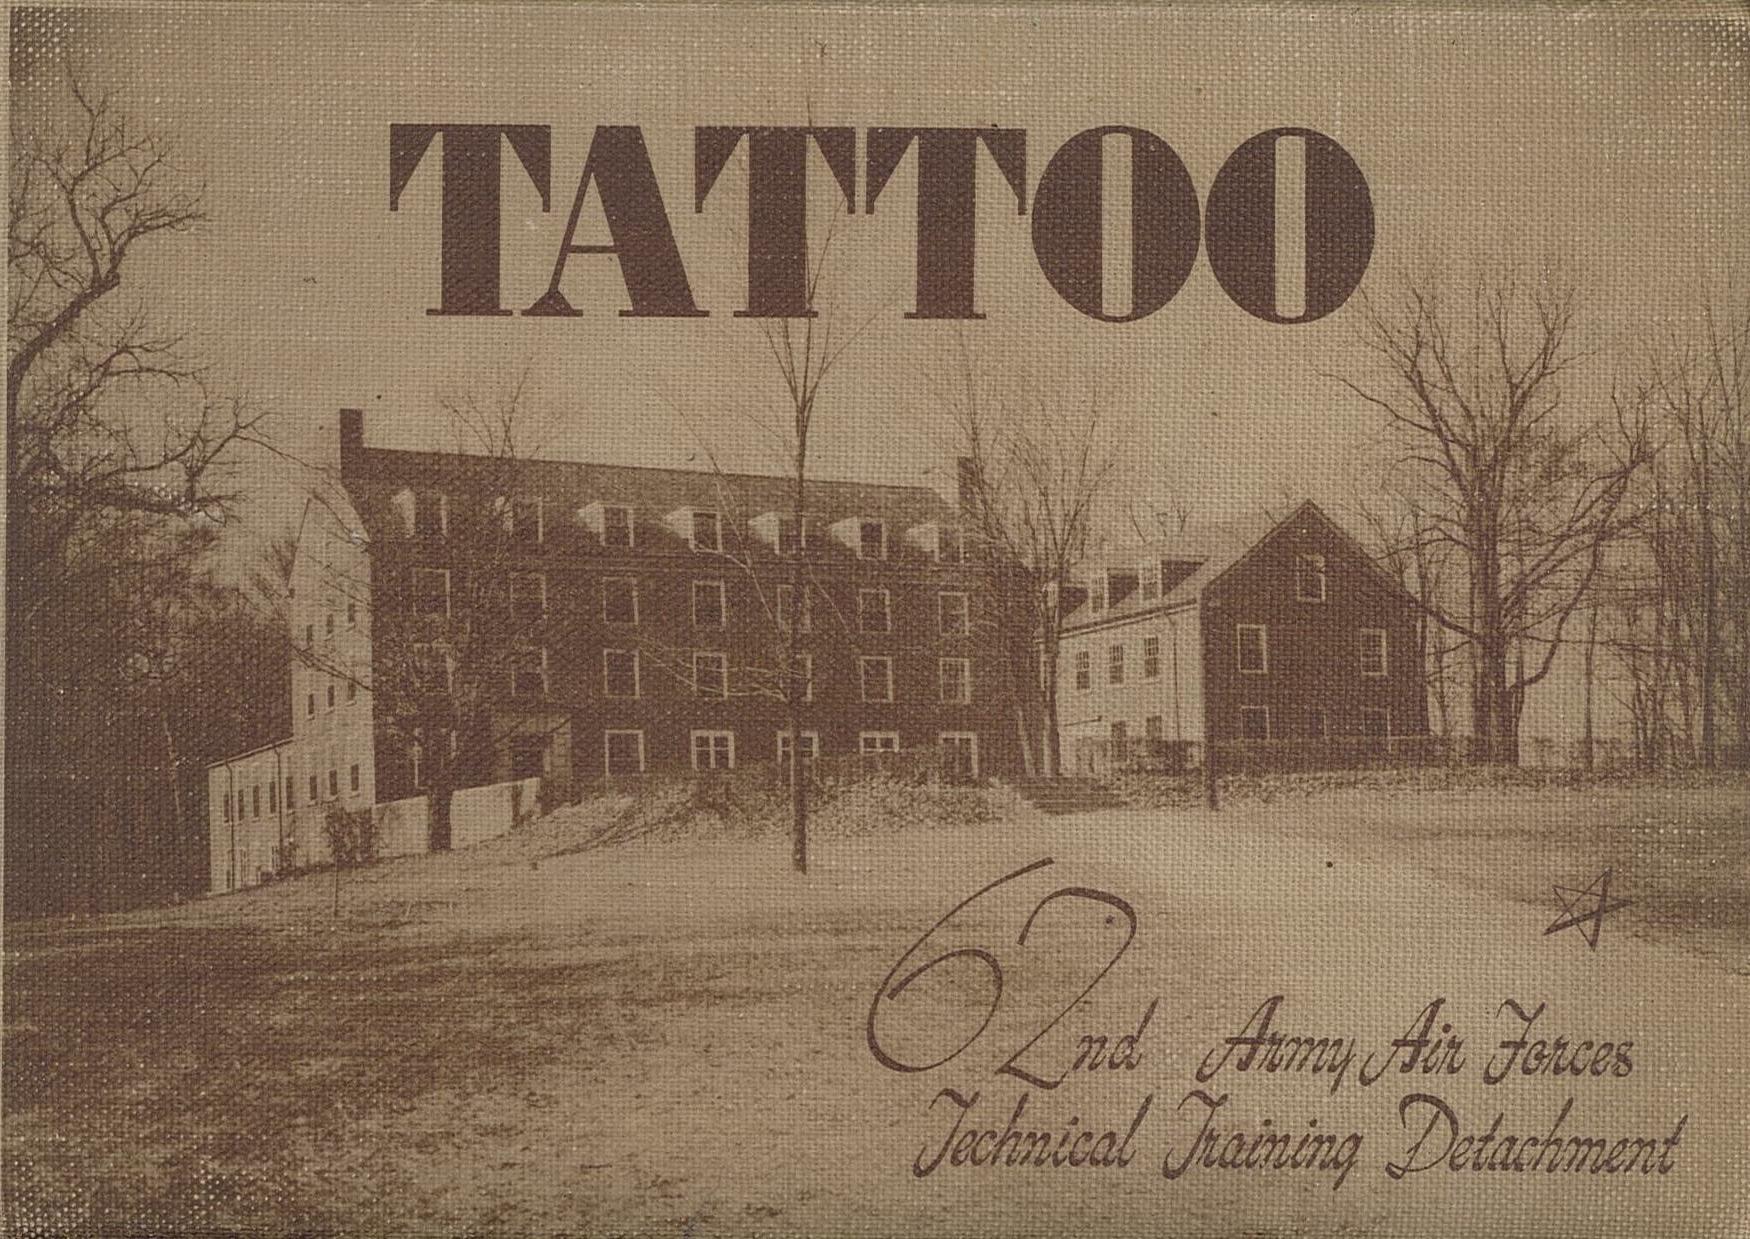 Tattoo Yearbook Cover.jpg